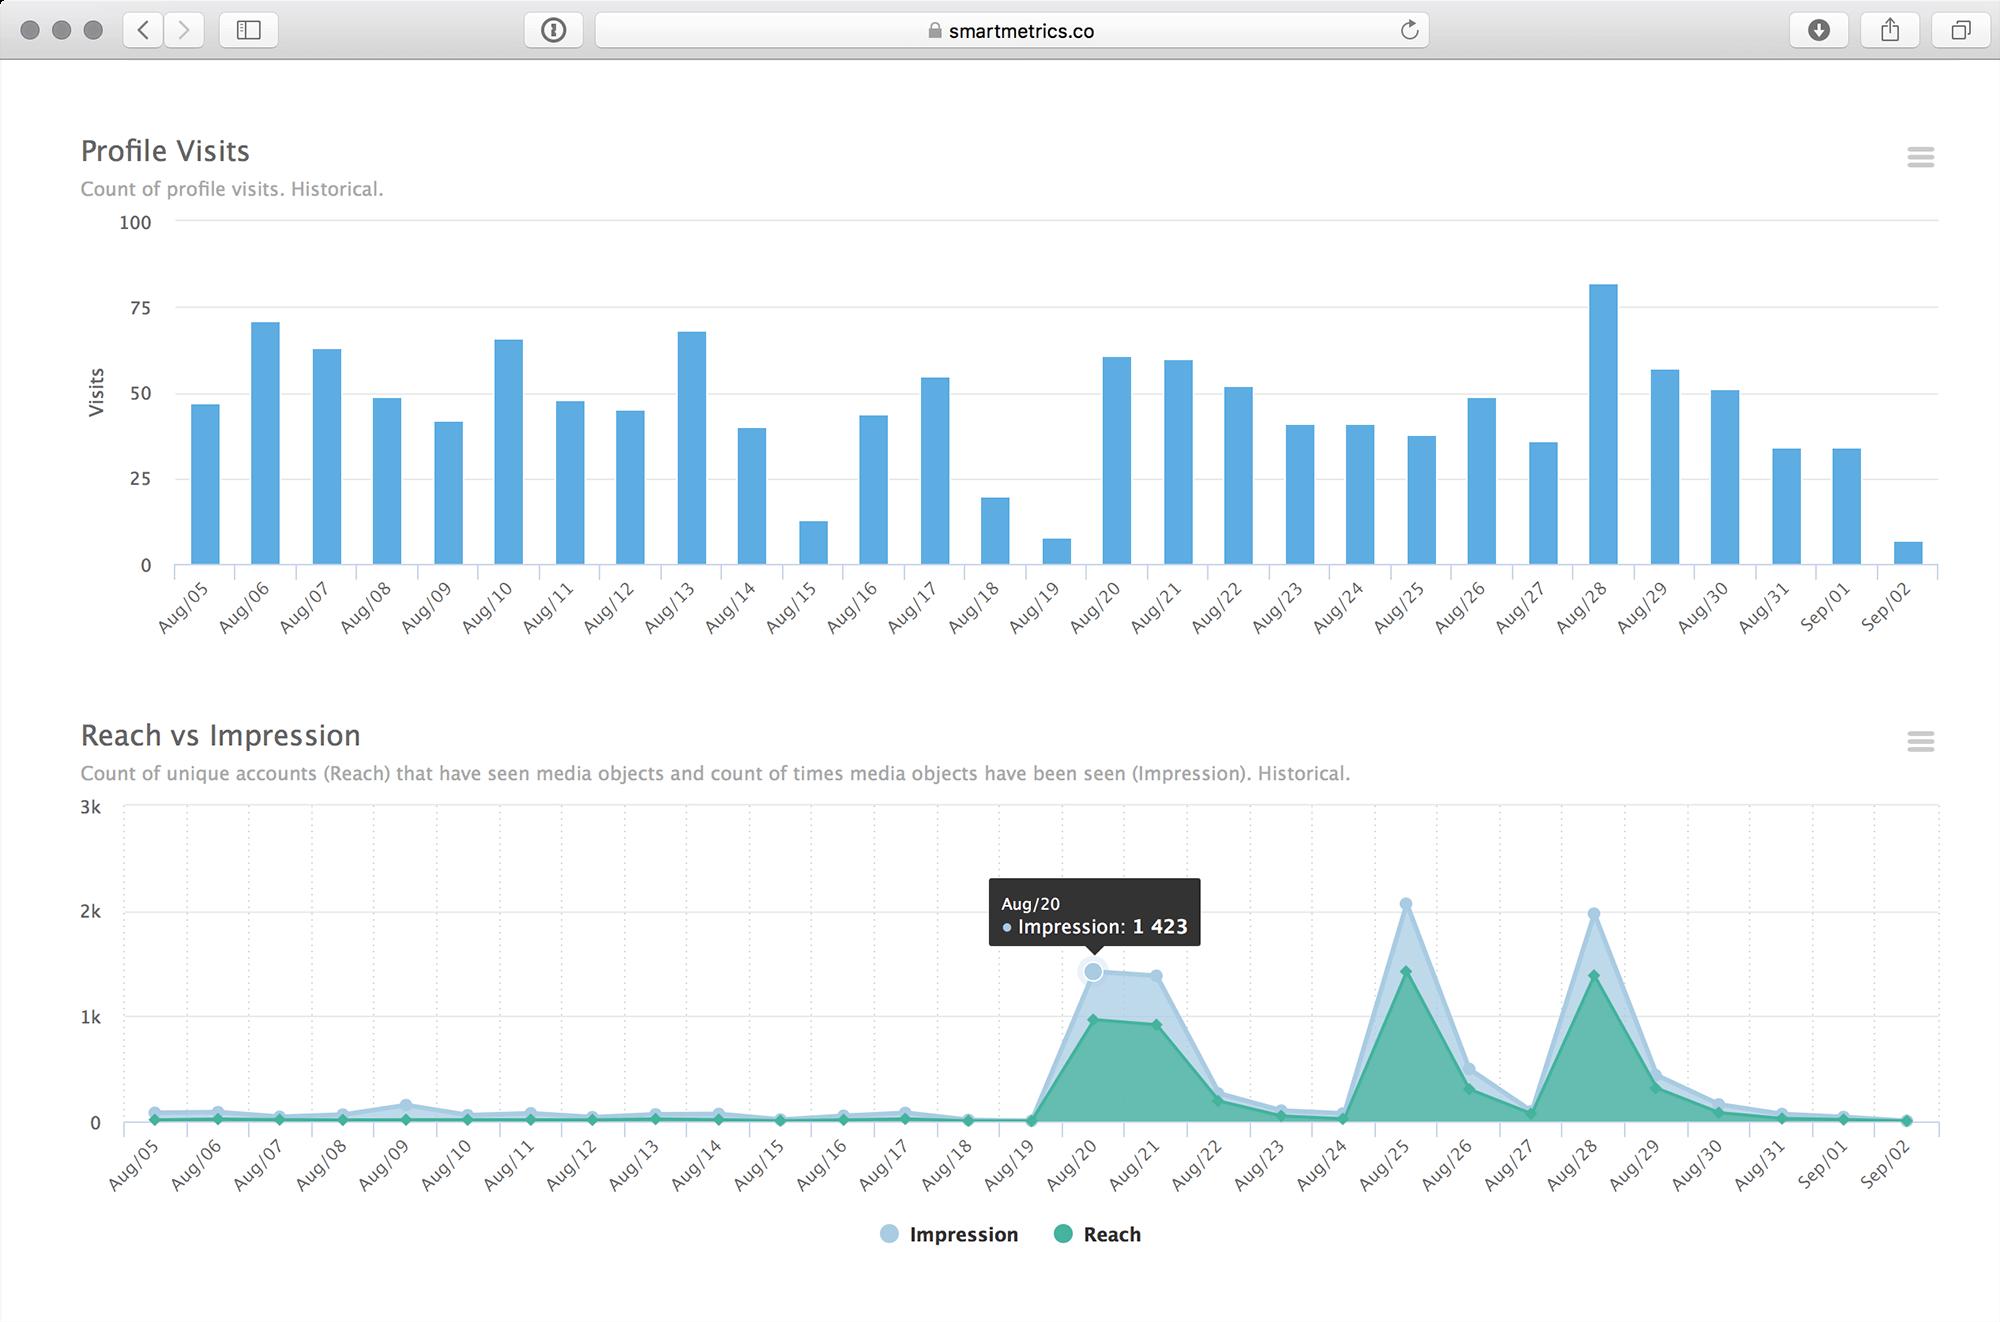 Instagram Analytics & Insights - smartmetrics co